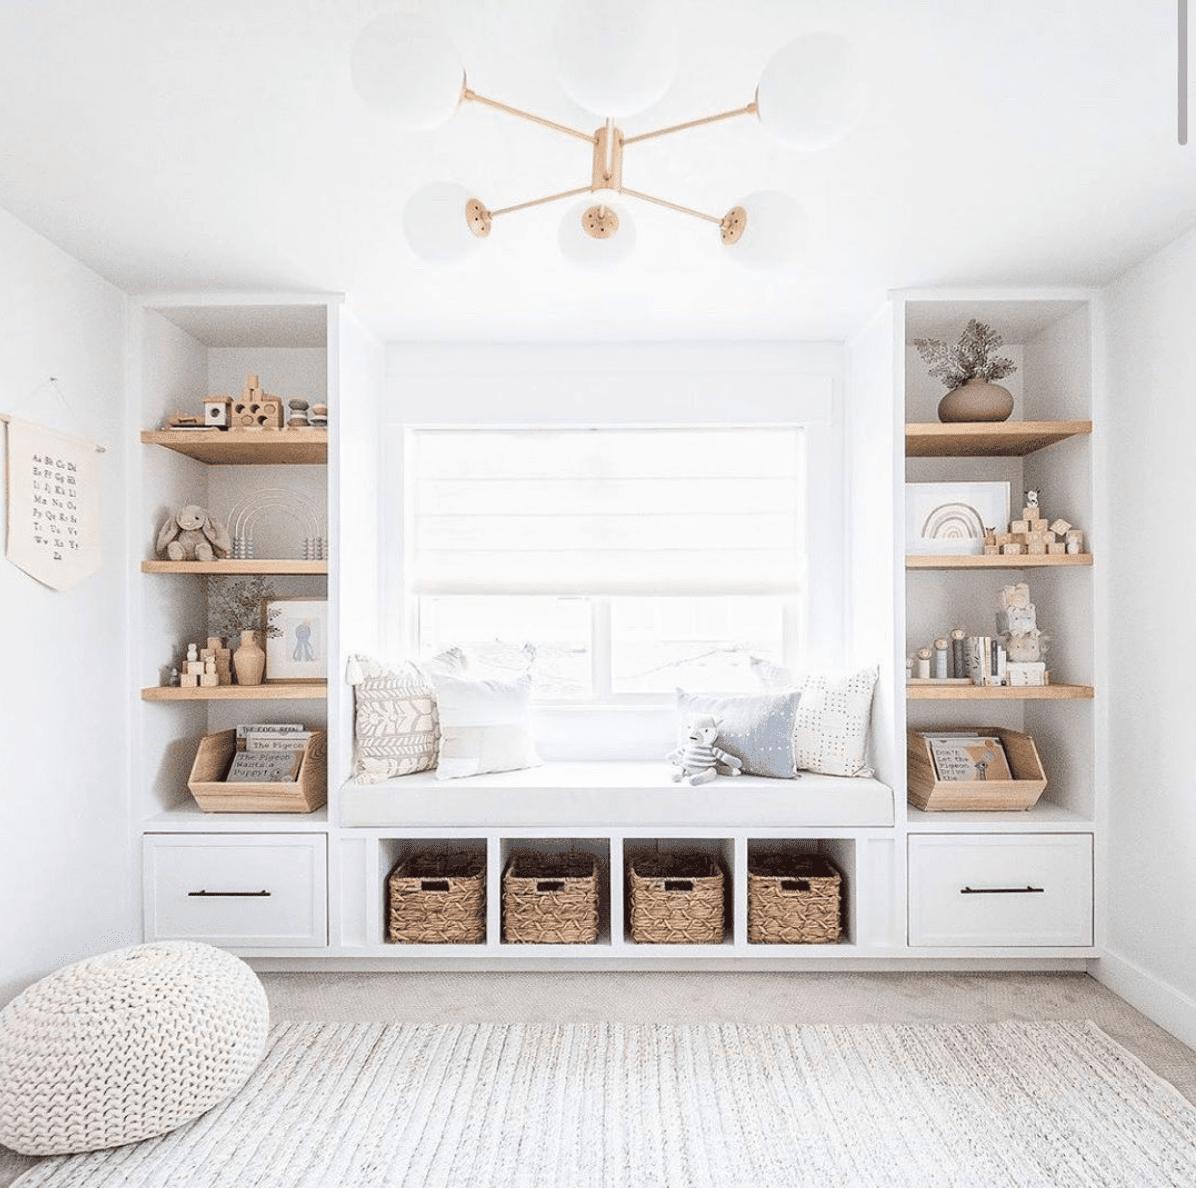 Incorporating stuffed animals into a room's decor scheme